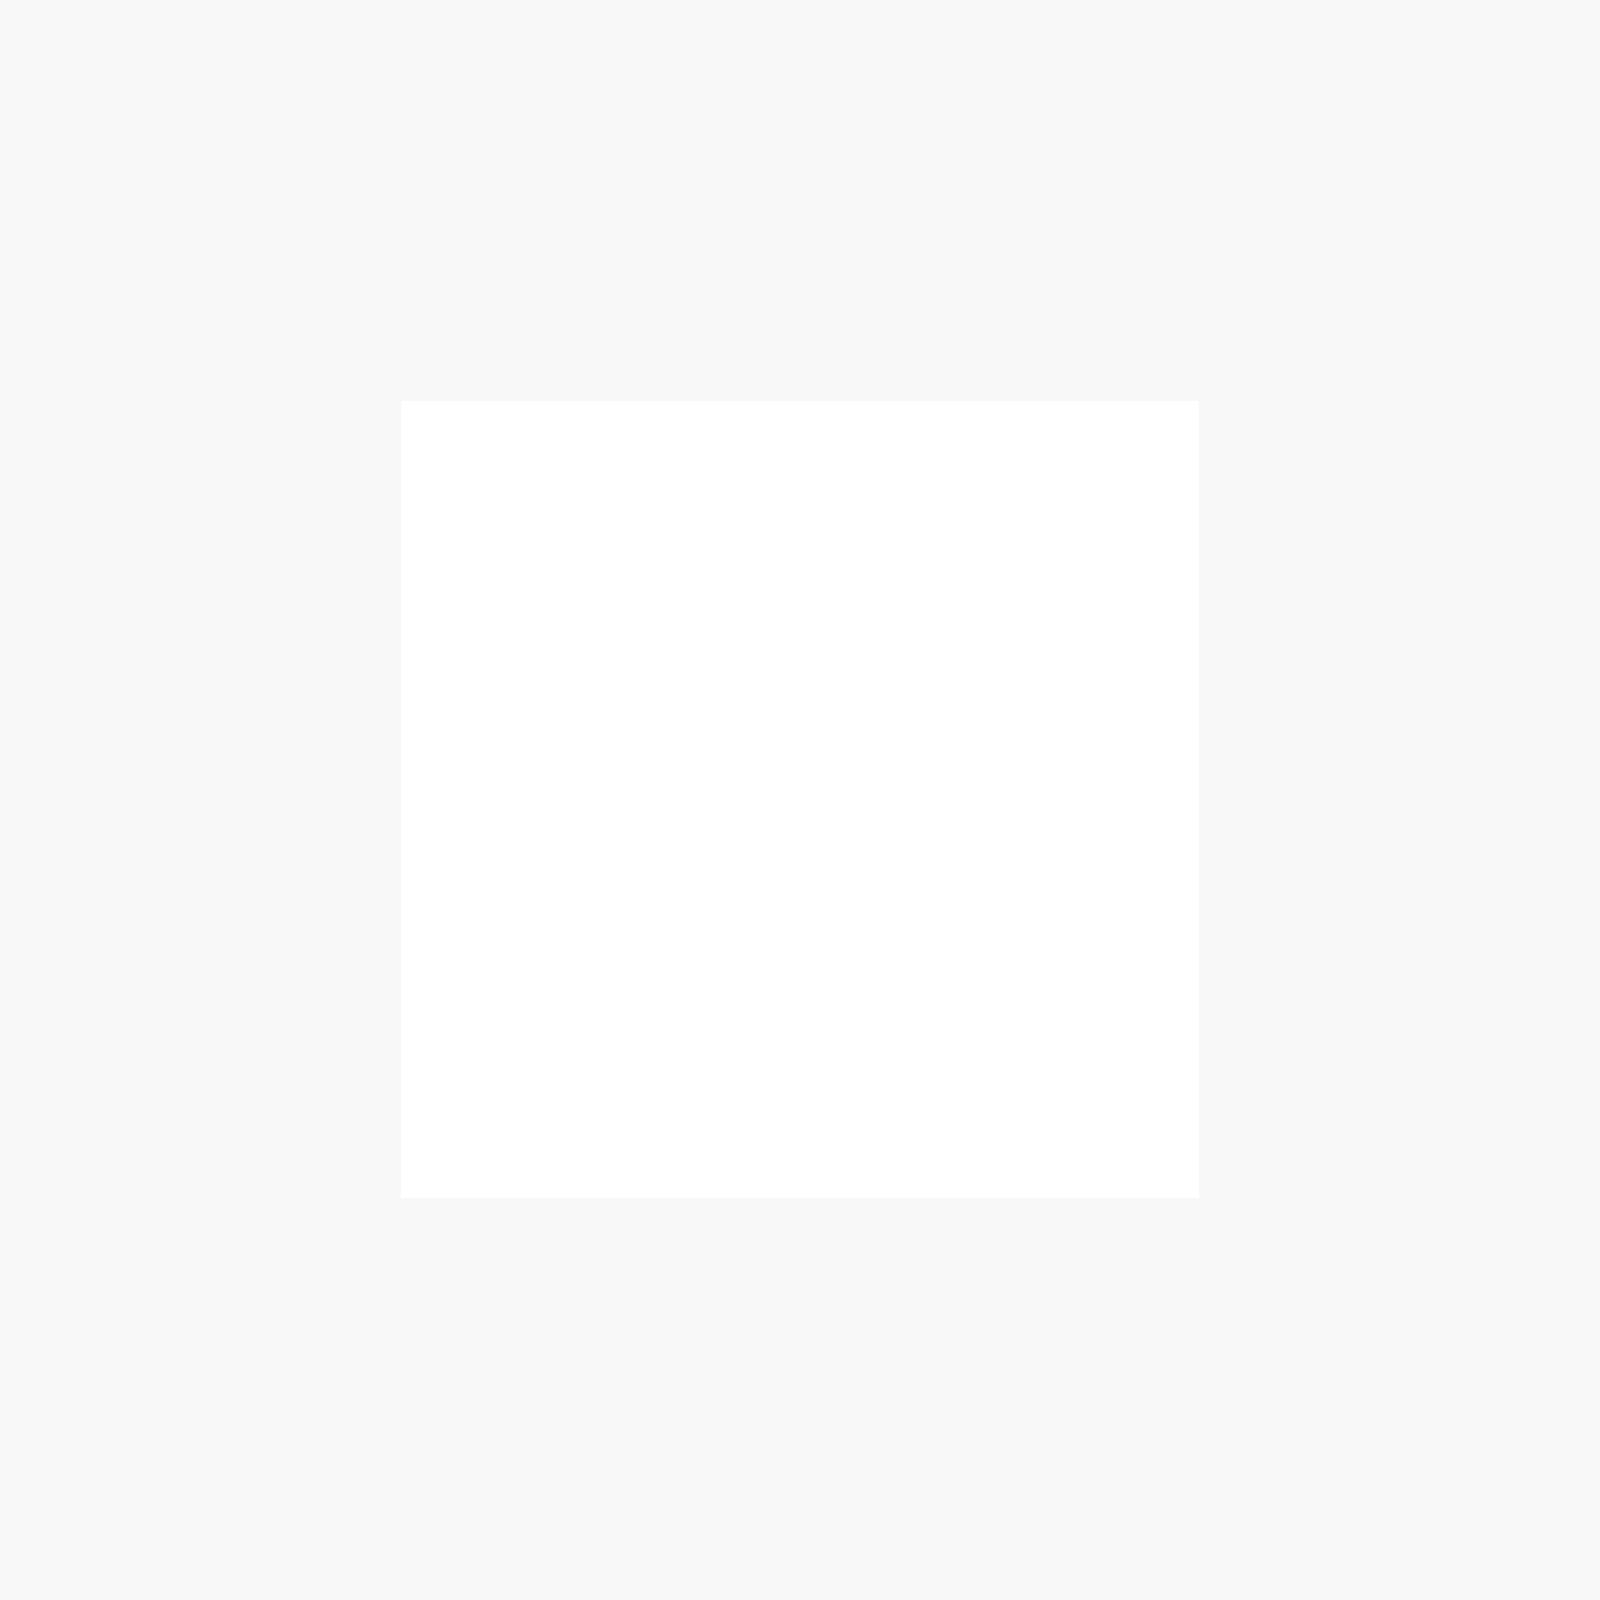 Duratile 20 x 20cm Gloss White Wall Tile - 25 Pack